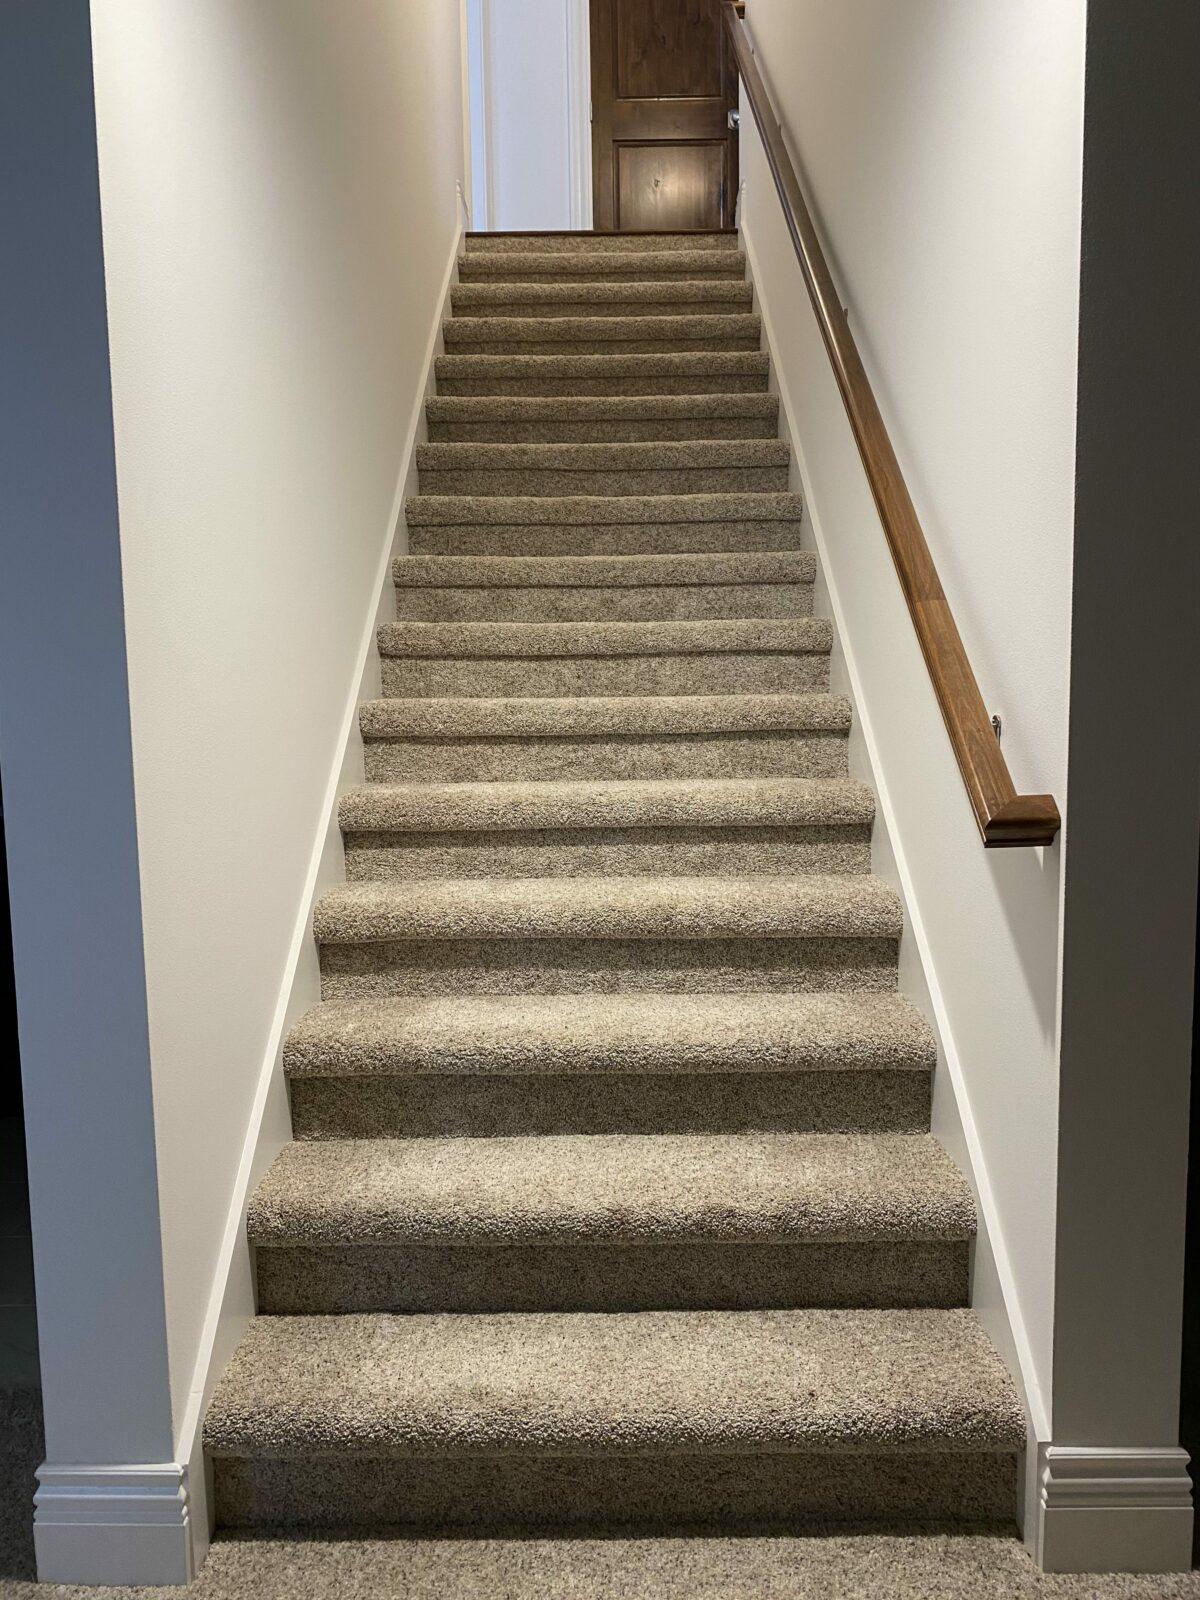 Stairs carpet flooring   H&R Carpets and Flooring